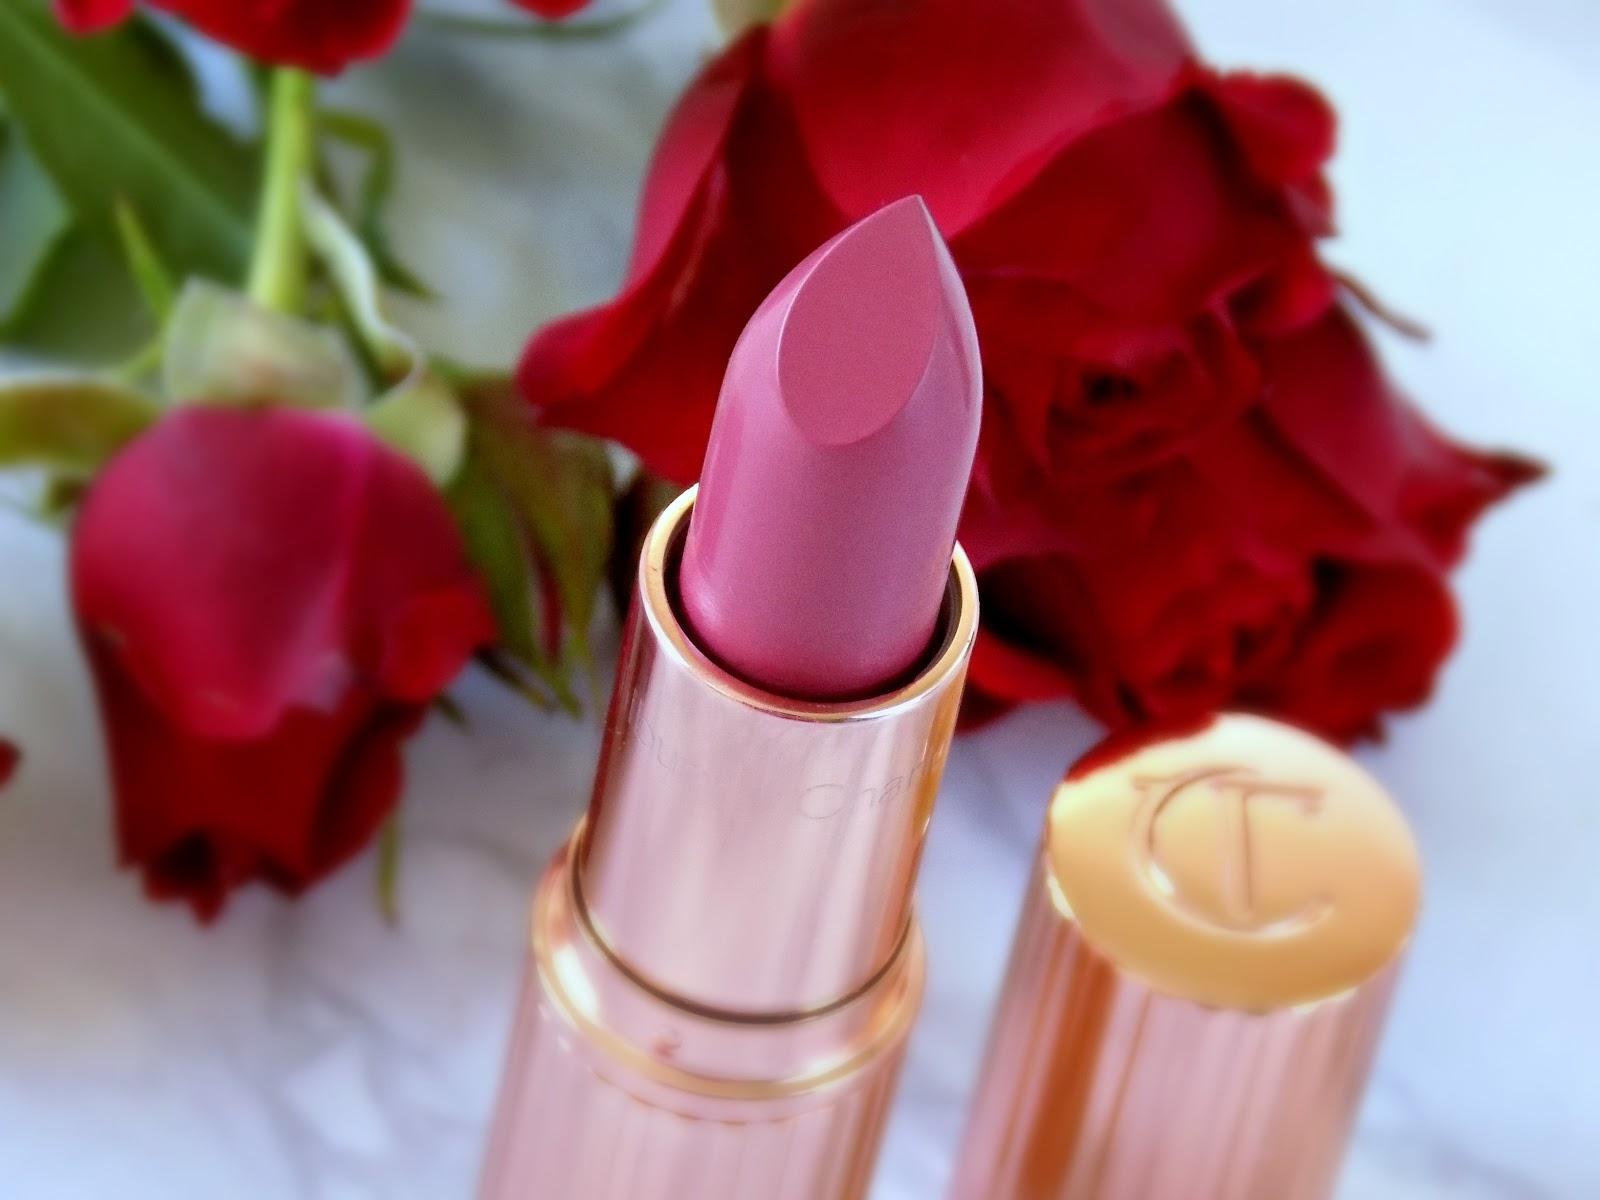 Charlotte Tilbury K.I.S.S.I.N.G Lipstick in Kiss Chase